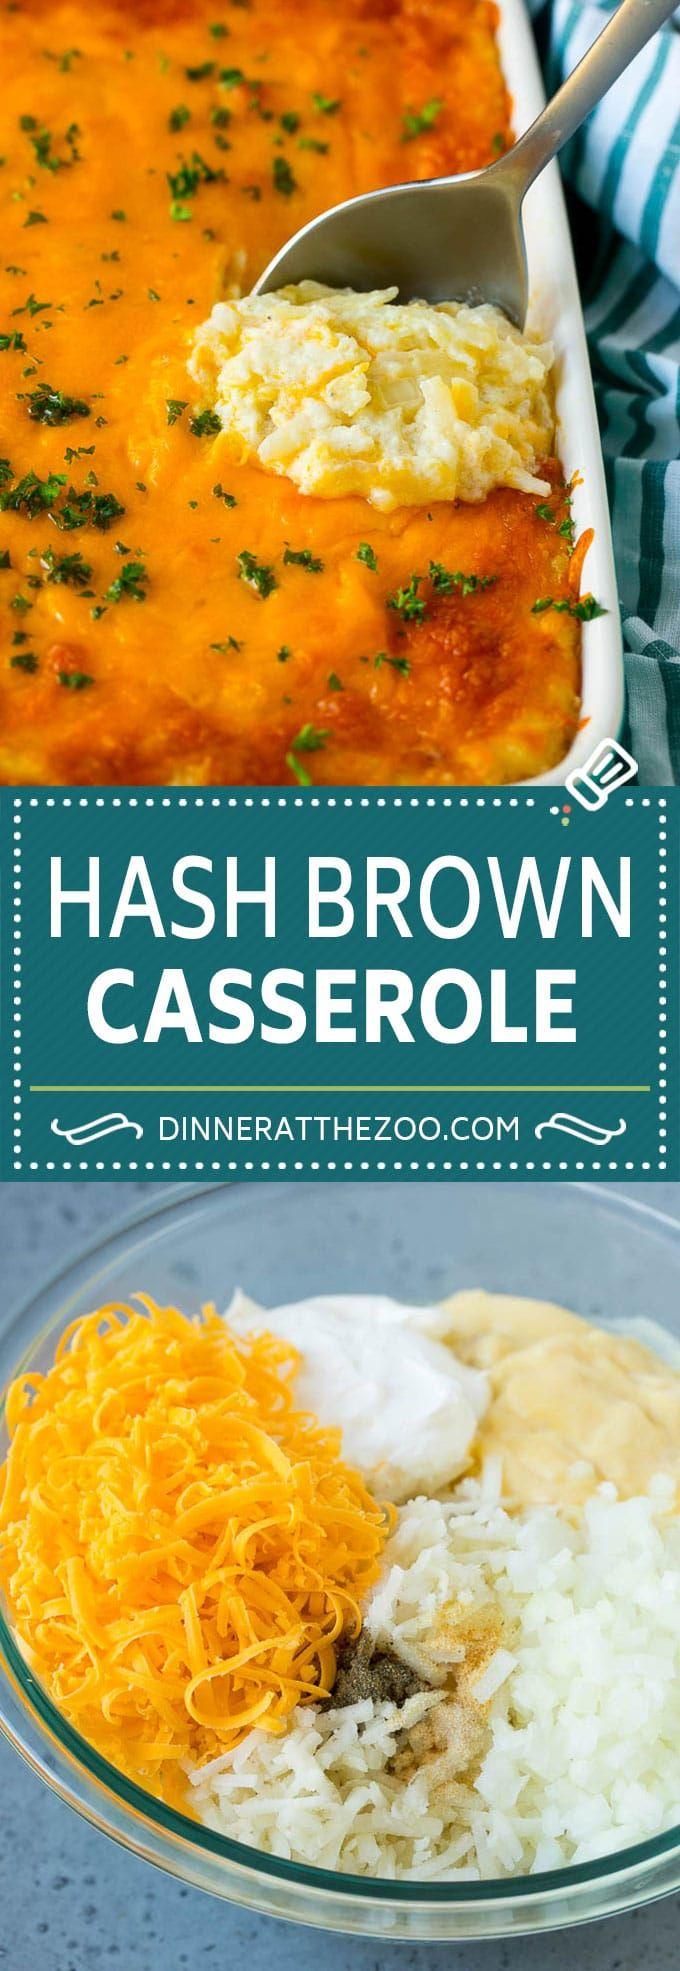 Hash Brown Casserole   Potato Casserole   Hash Brown Side Dish